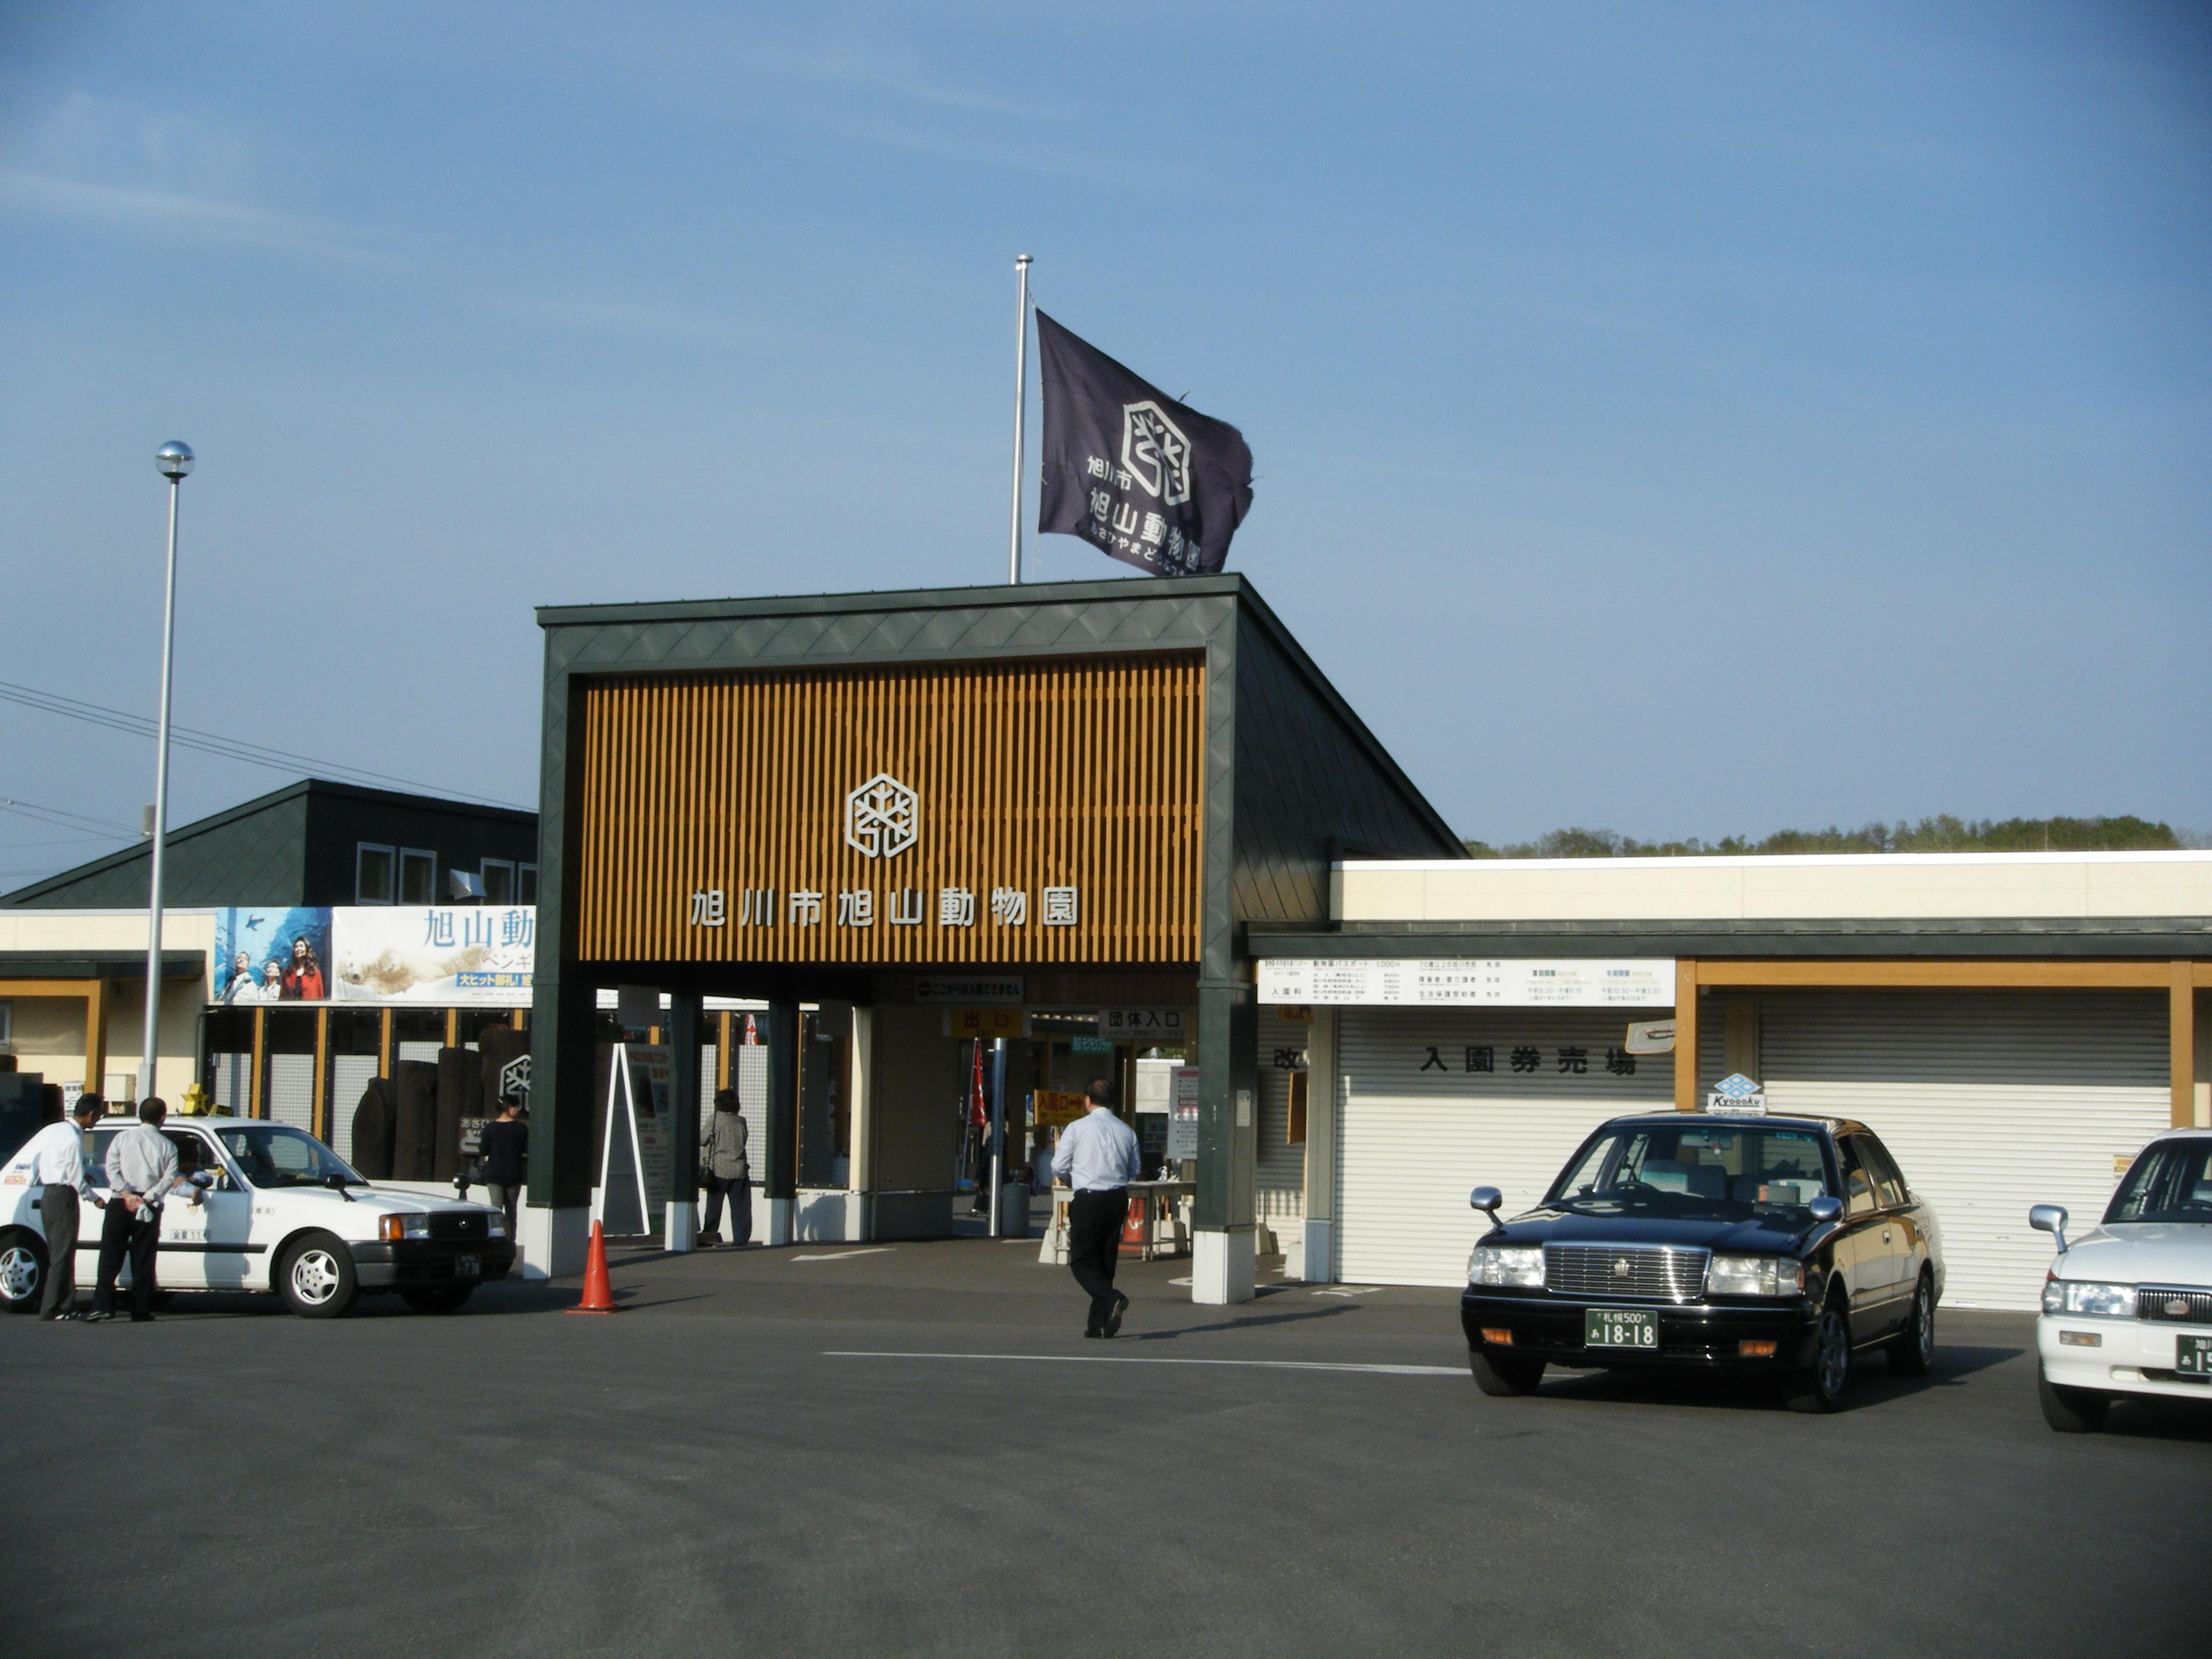 https://upload.wikimedia.org/wikipedia/commons/e/e8/Asahiyama_zoo_entrance.jpg